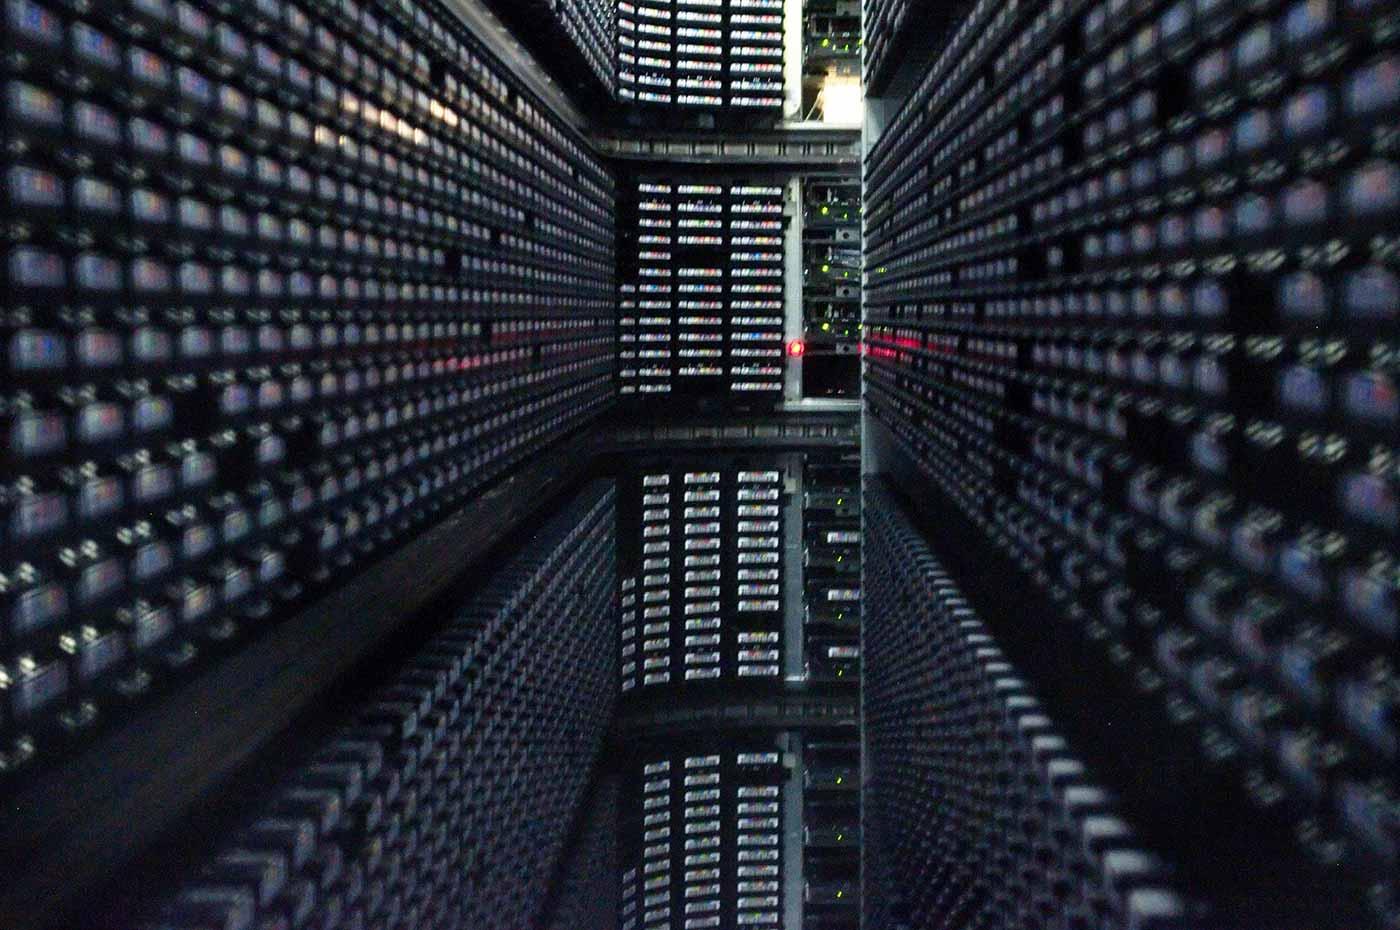 Interior of StorageTek tape library at NERSC.